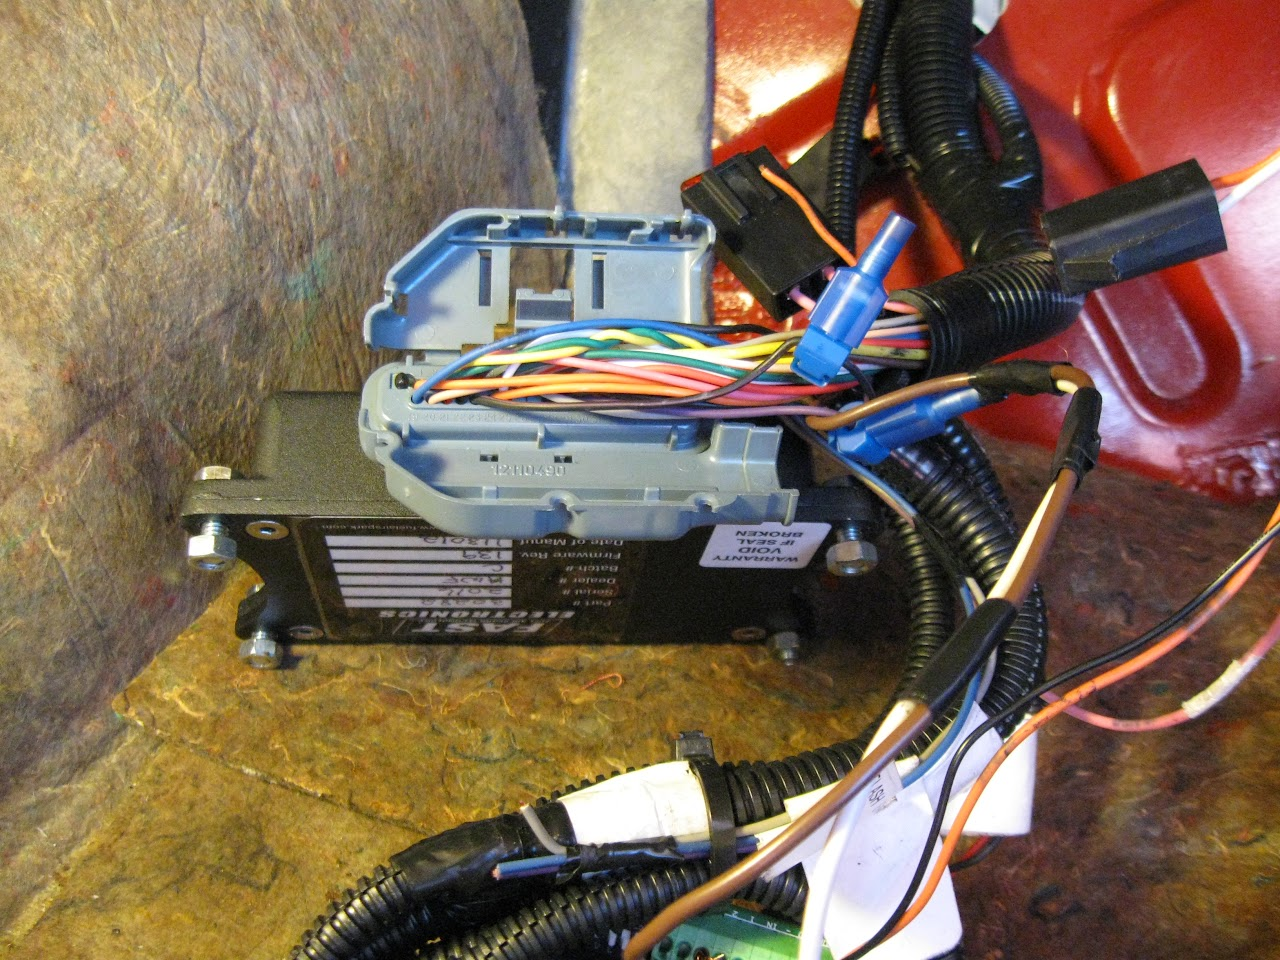 hight resolution of tci ez tcu wiring diagram wiring diagrams favorites tci ez tcu wiring diagram tci ez tcu wiring diagram